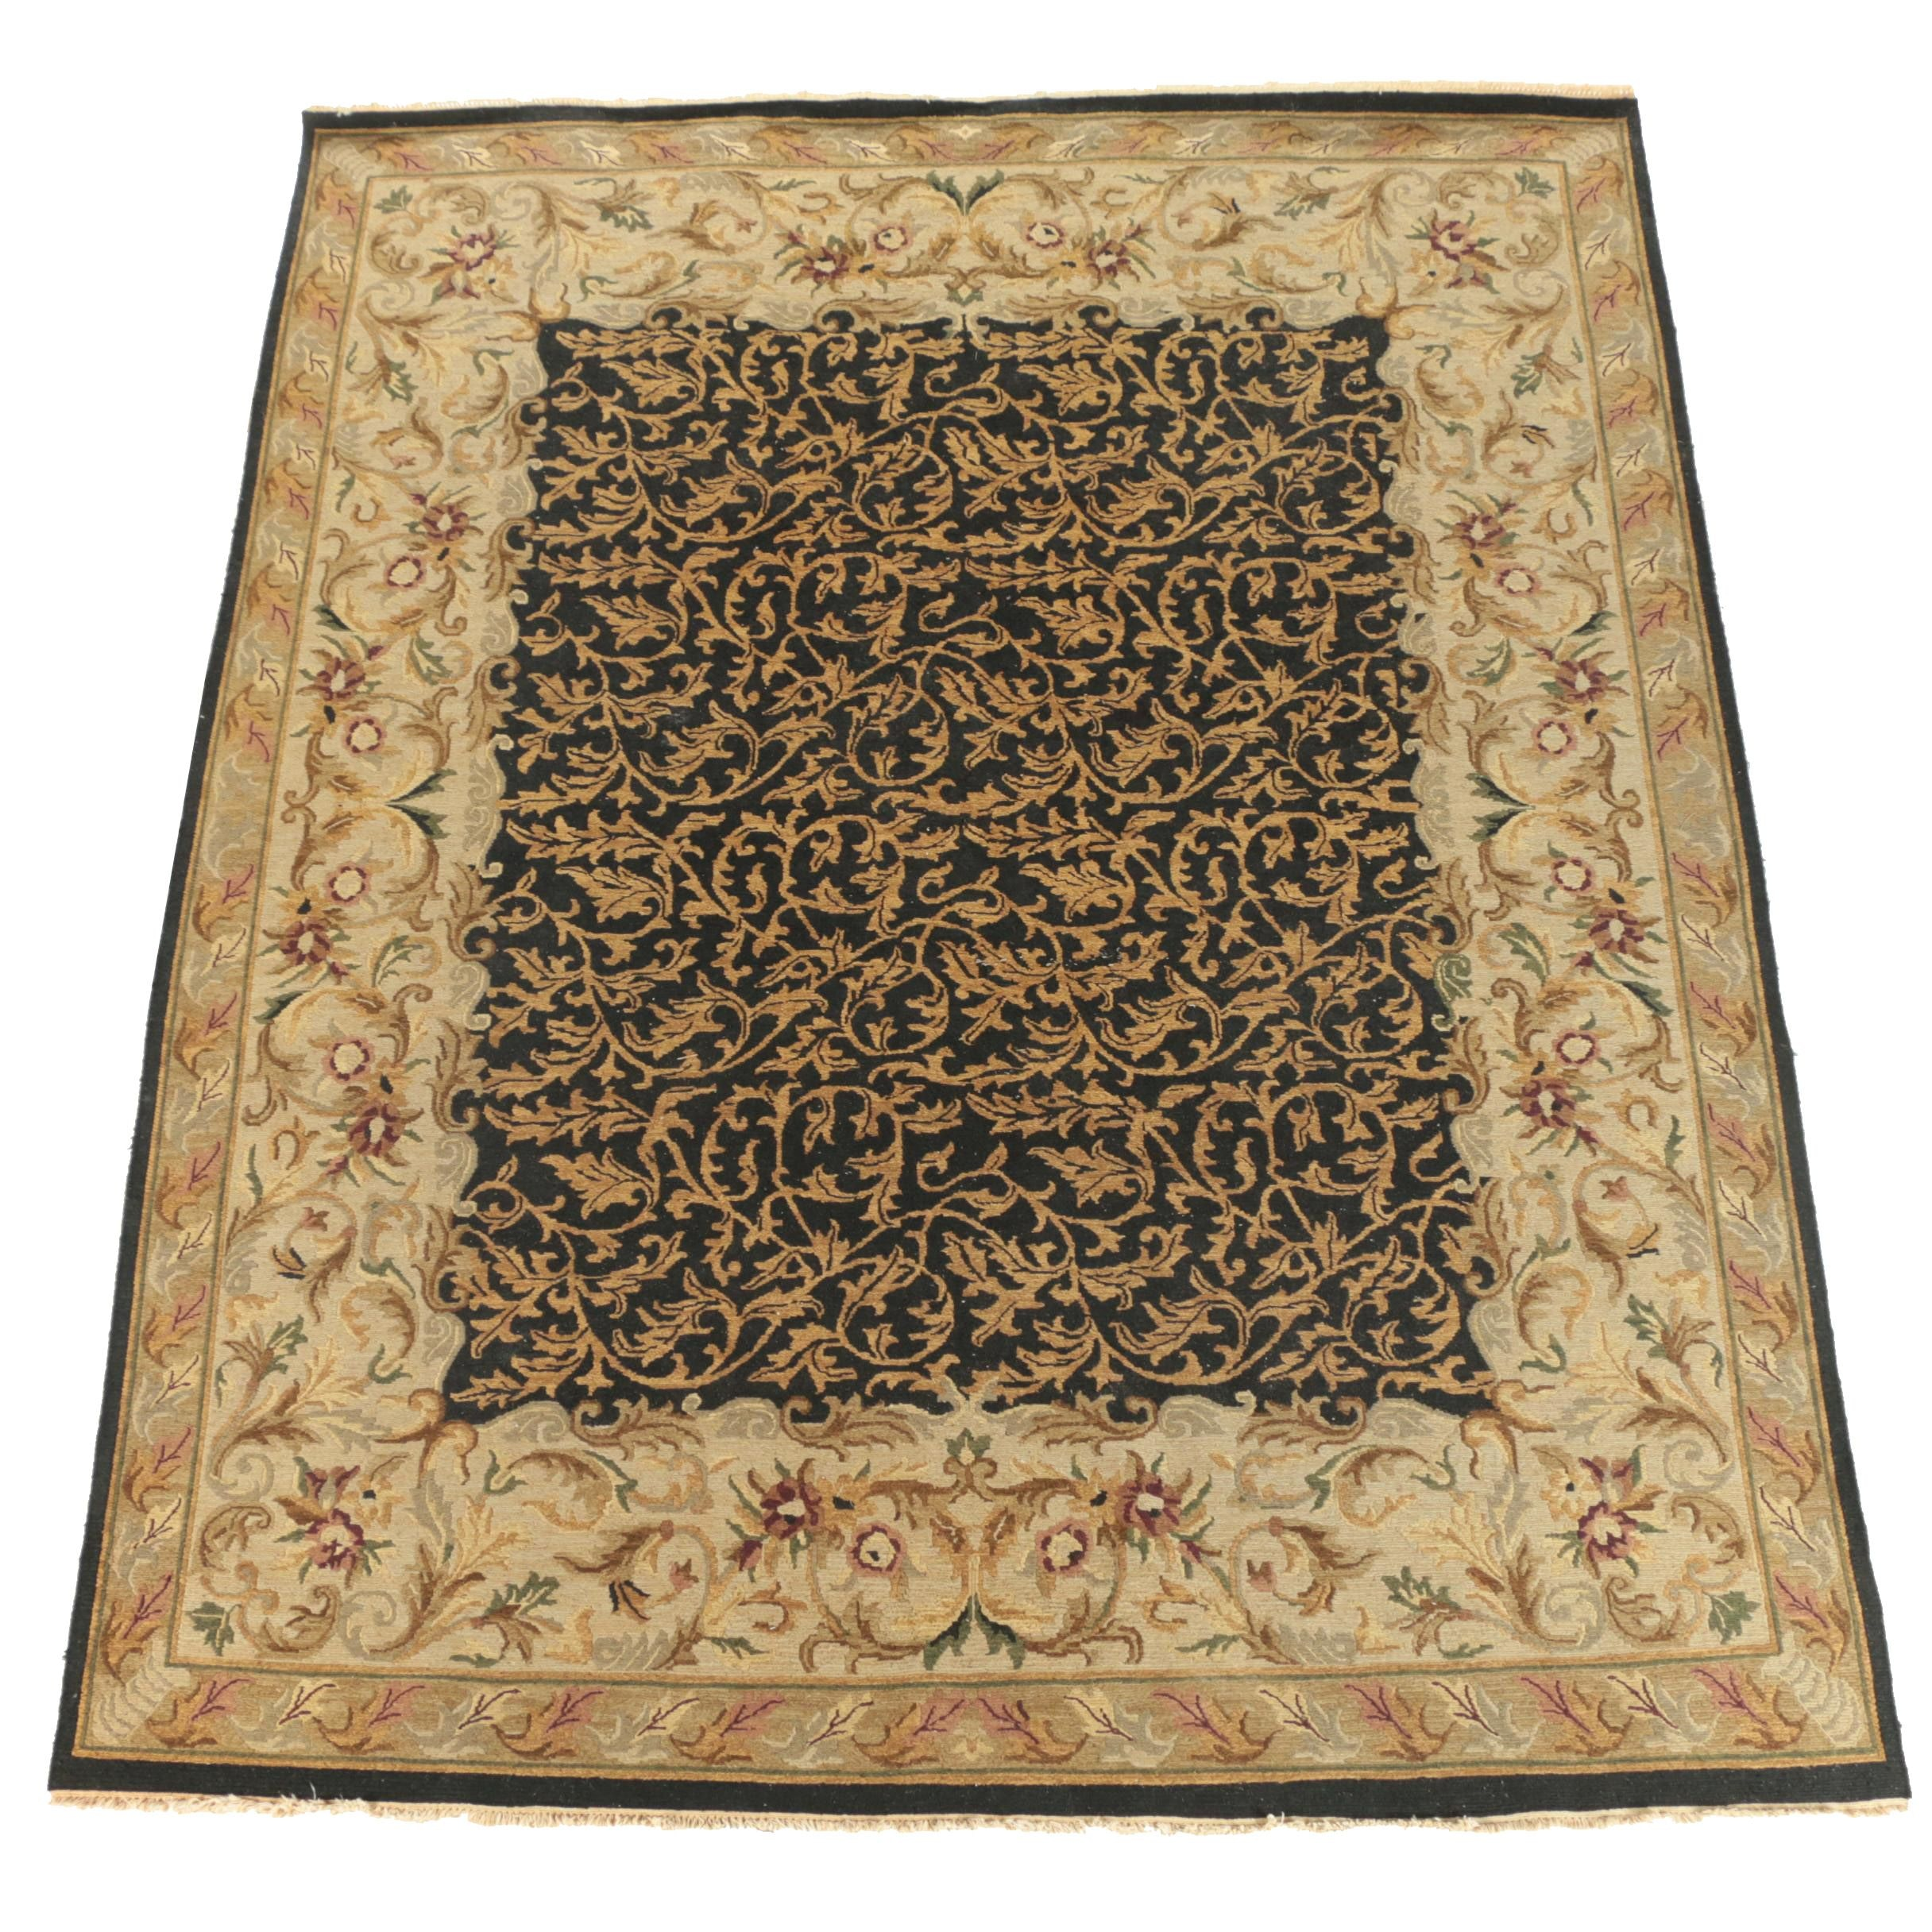 Handwoven Indian Foliate Wool Soumak Rug